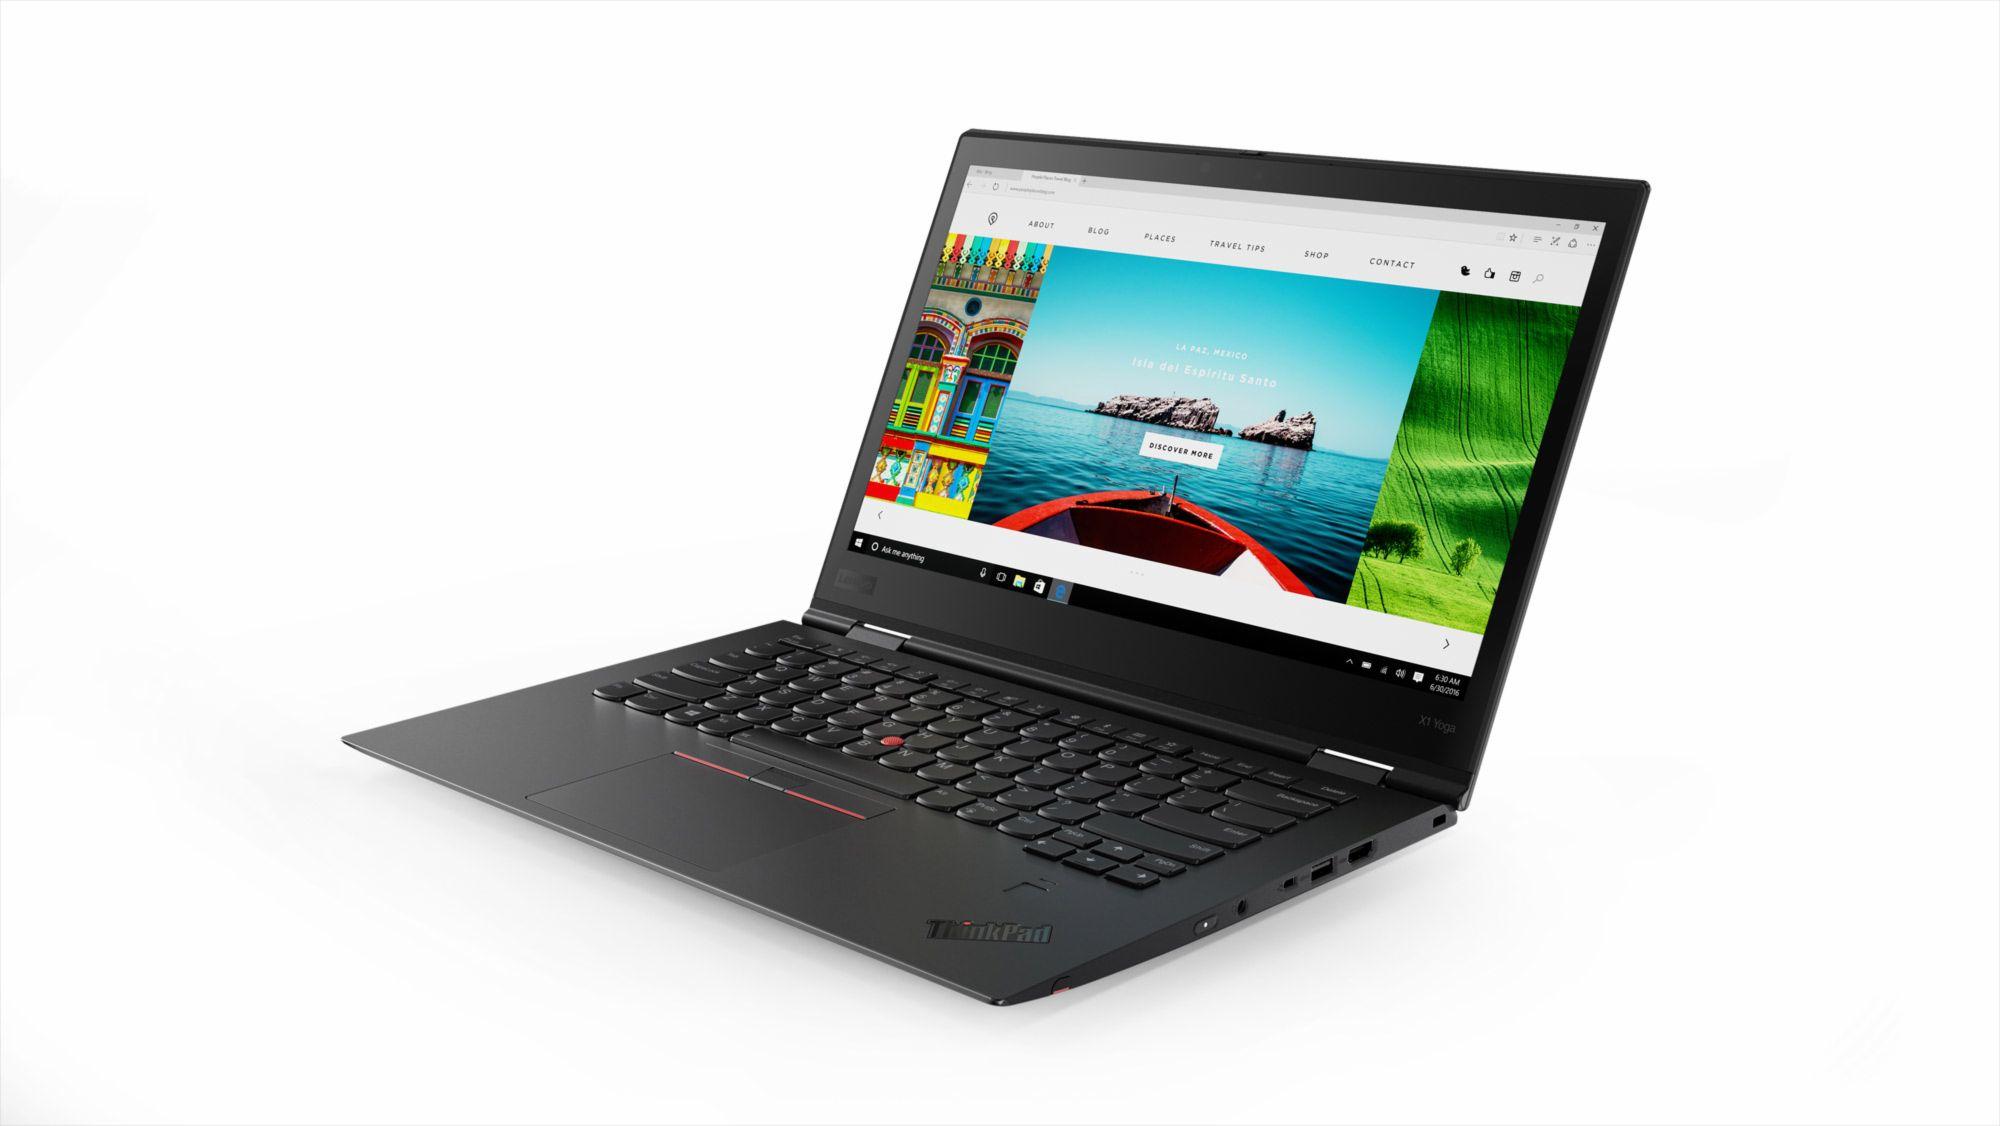 Lenovo ThinkPad X1 Yoga 1.80GHz i7-8550U 8th gen Intel® Core™ i7 14